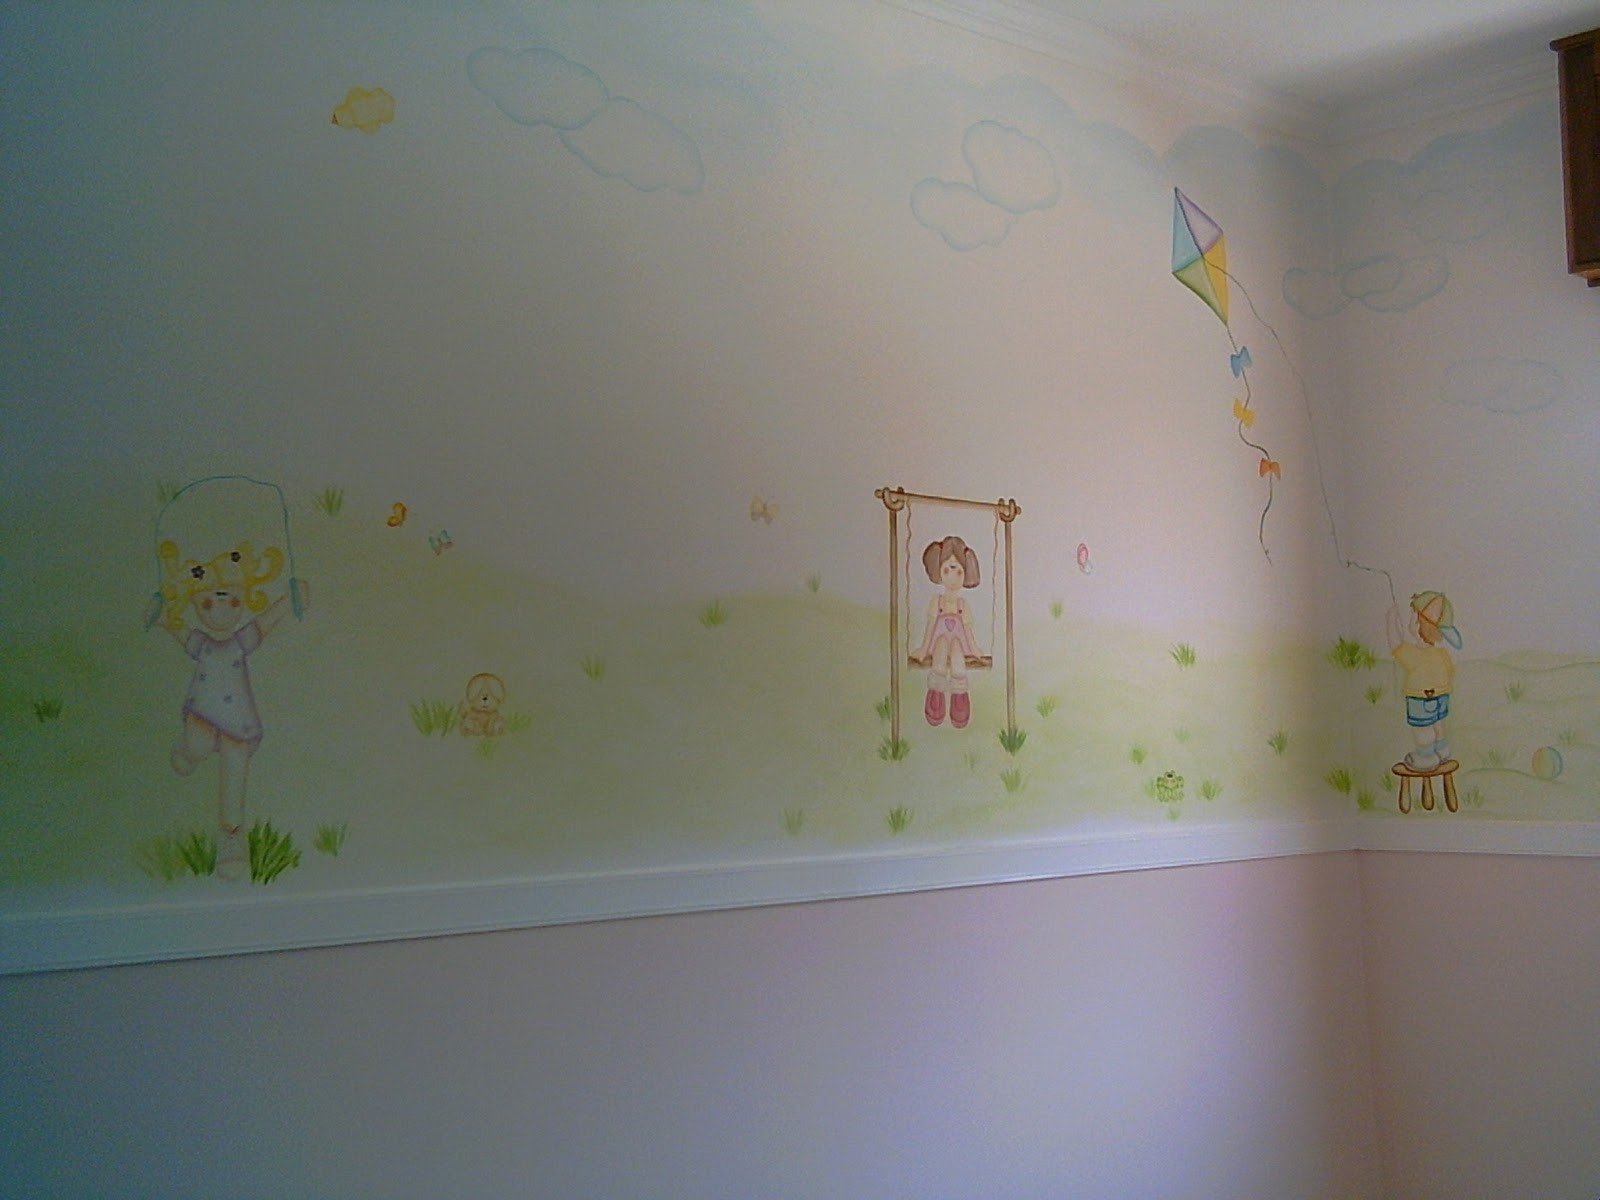 Giovana hotta giordani design de interiores pintura - Pintura decorativa paredes ...